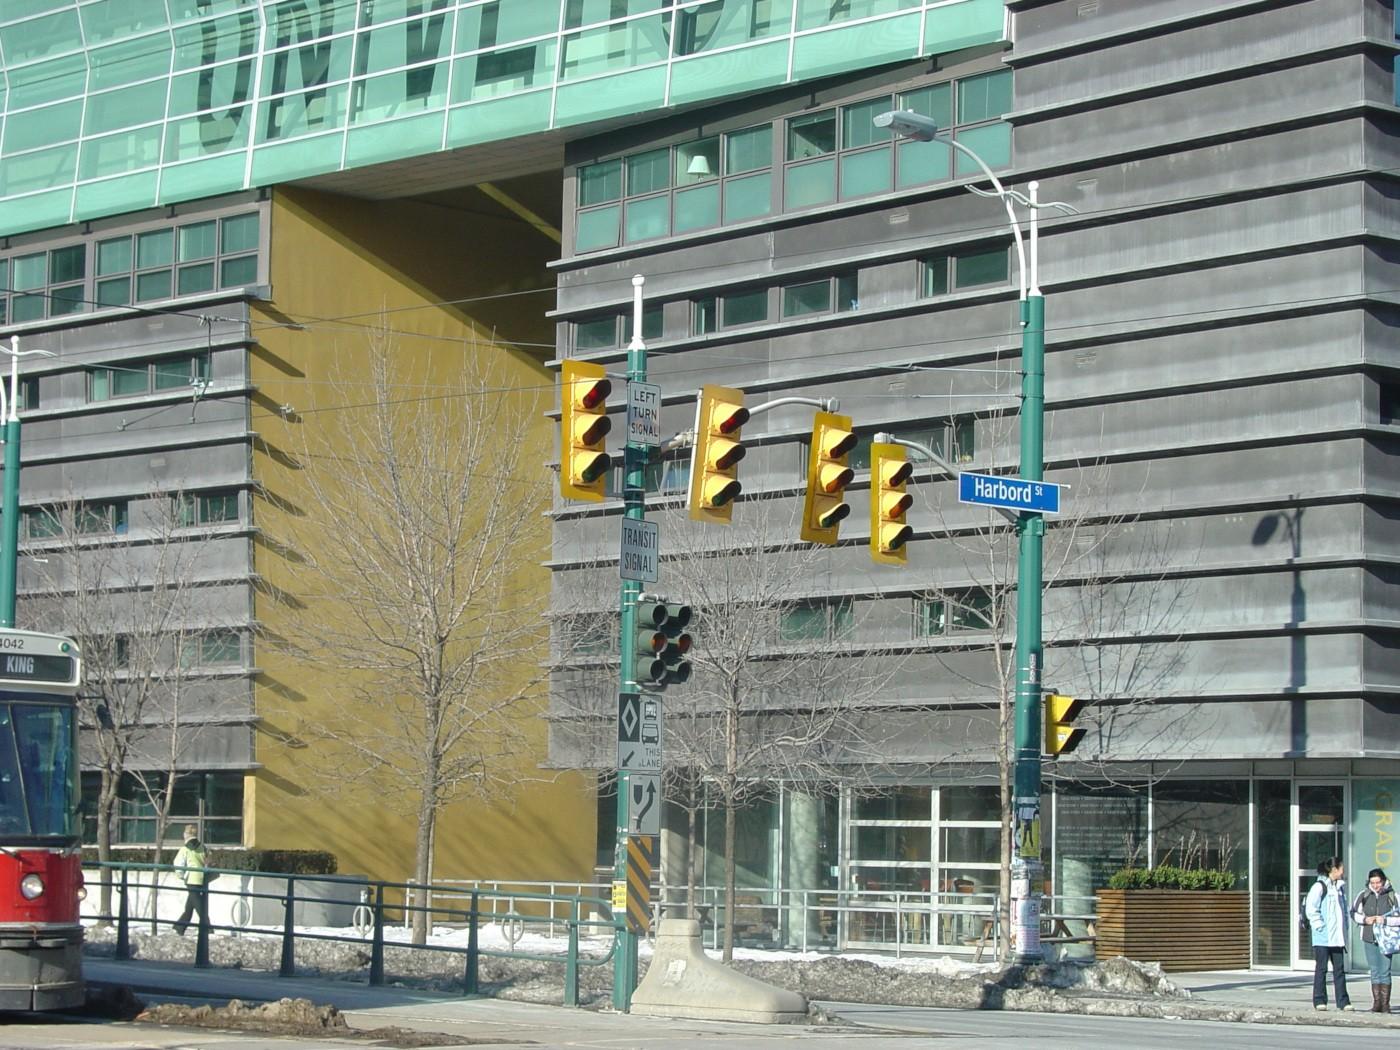 University of Toronto at Harbord St